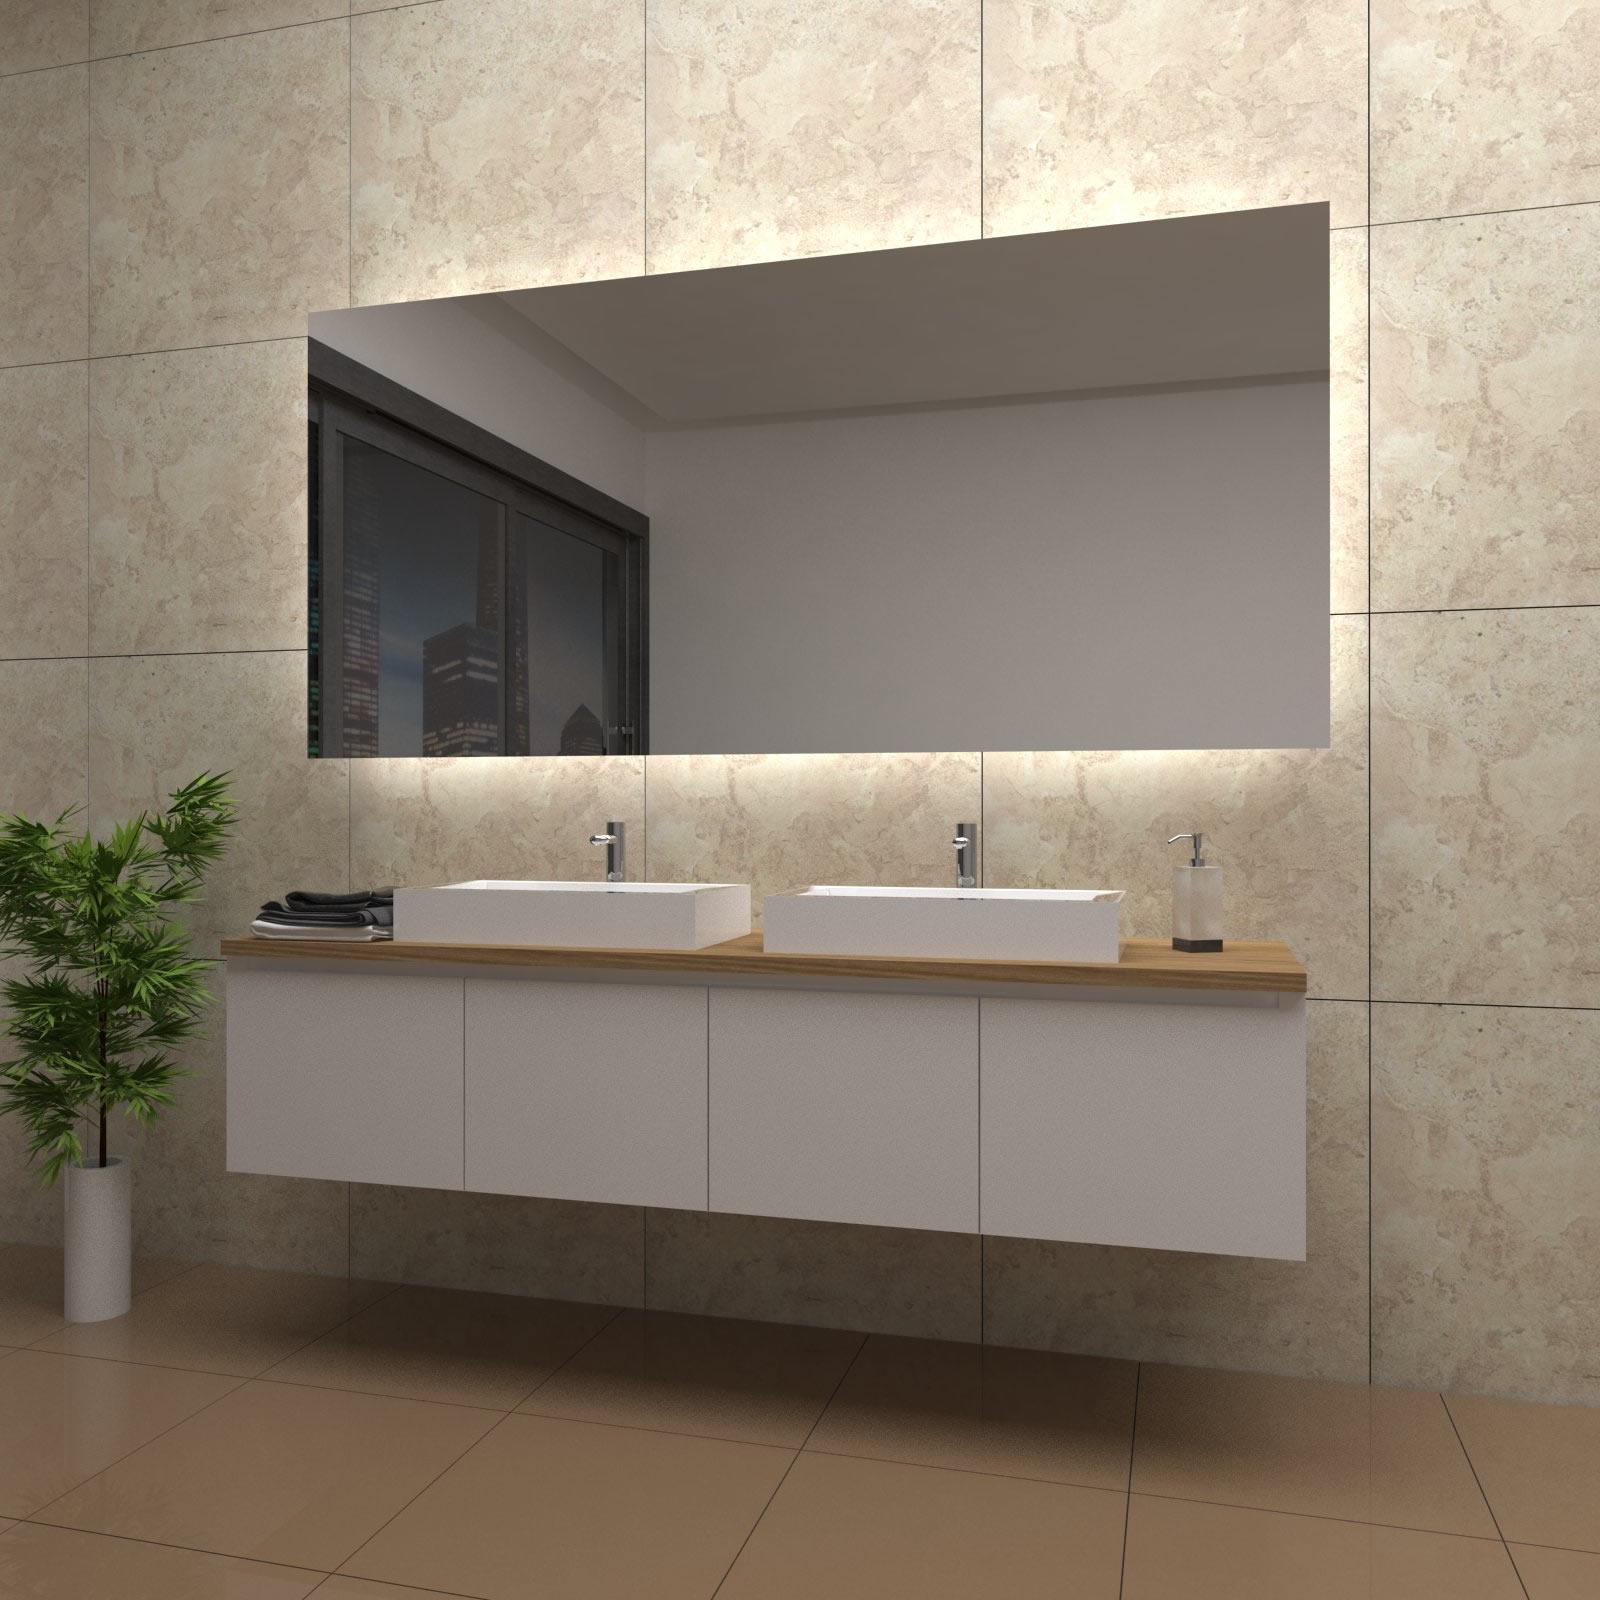 spiegelserie chloe badspiegel nach serie. Black Bedroom Furniture Sets. Home Design Ideas